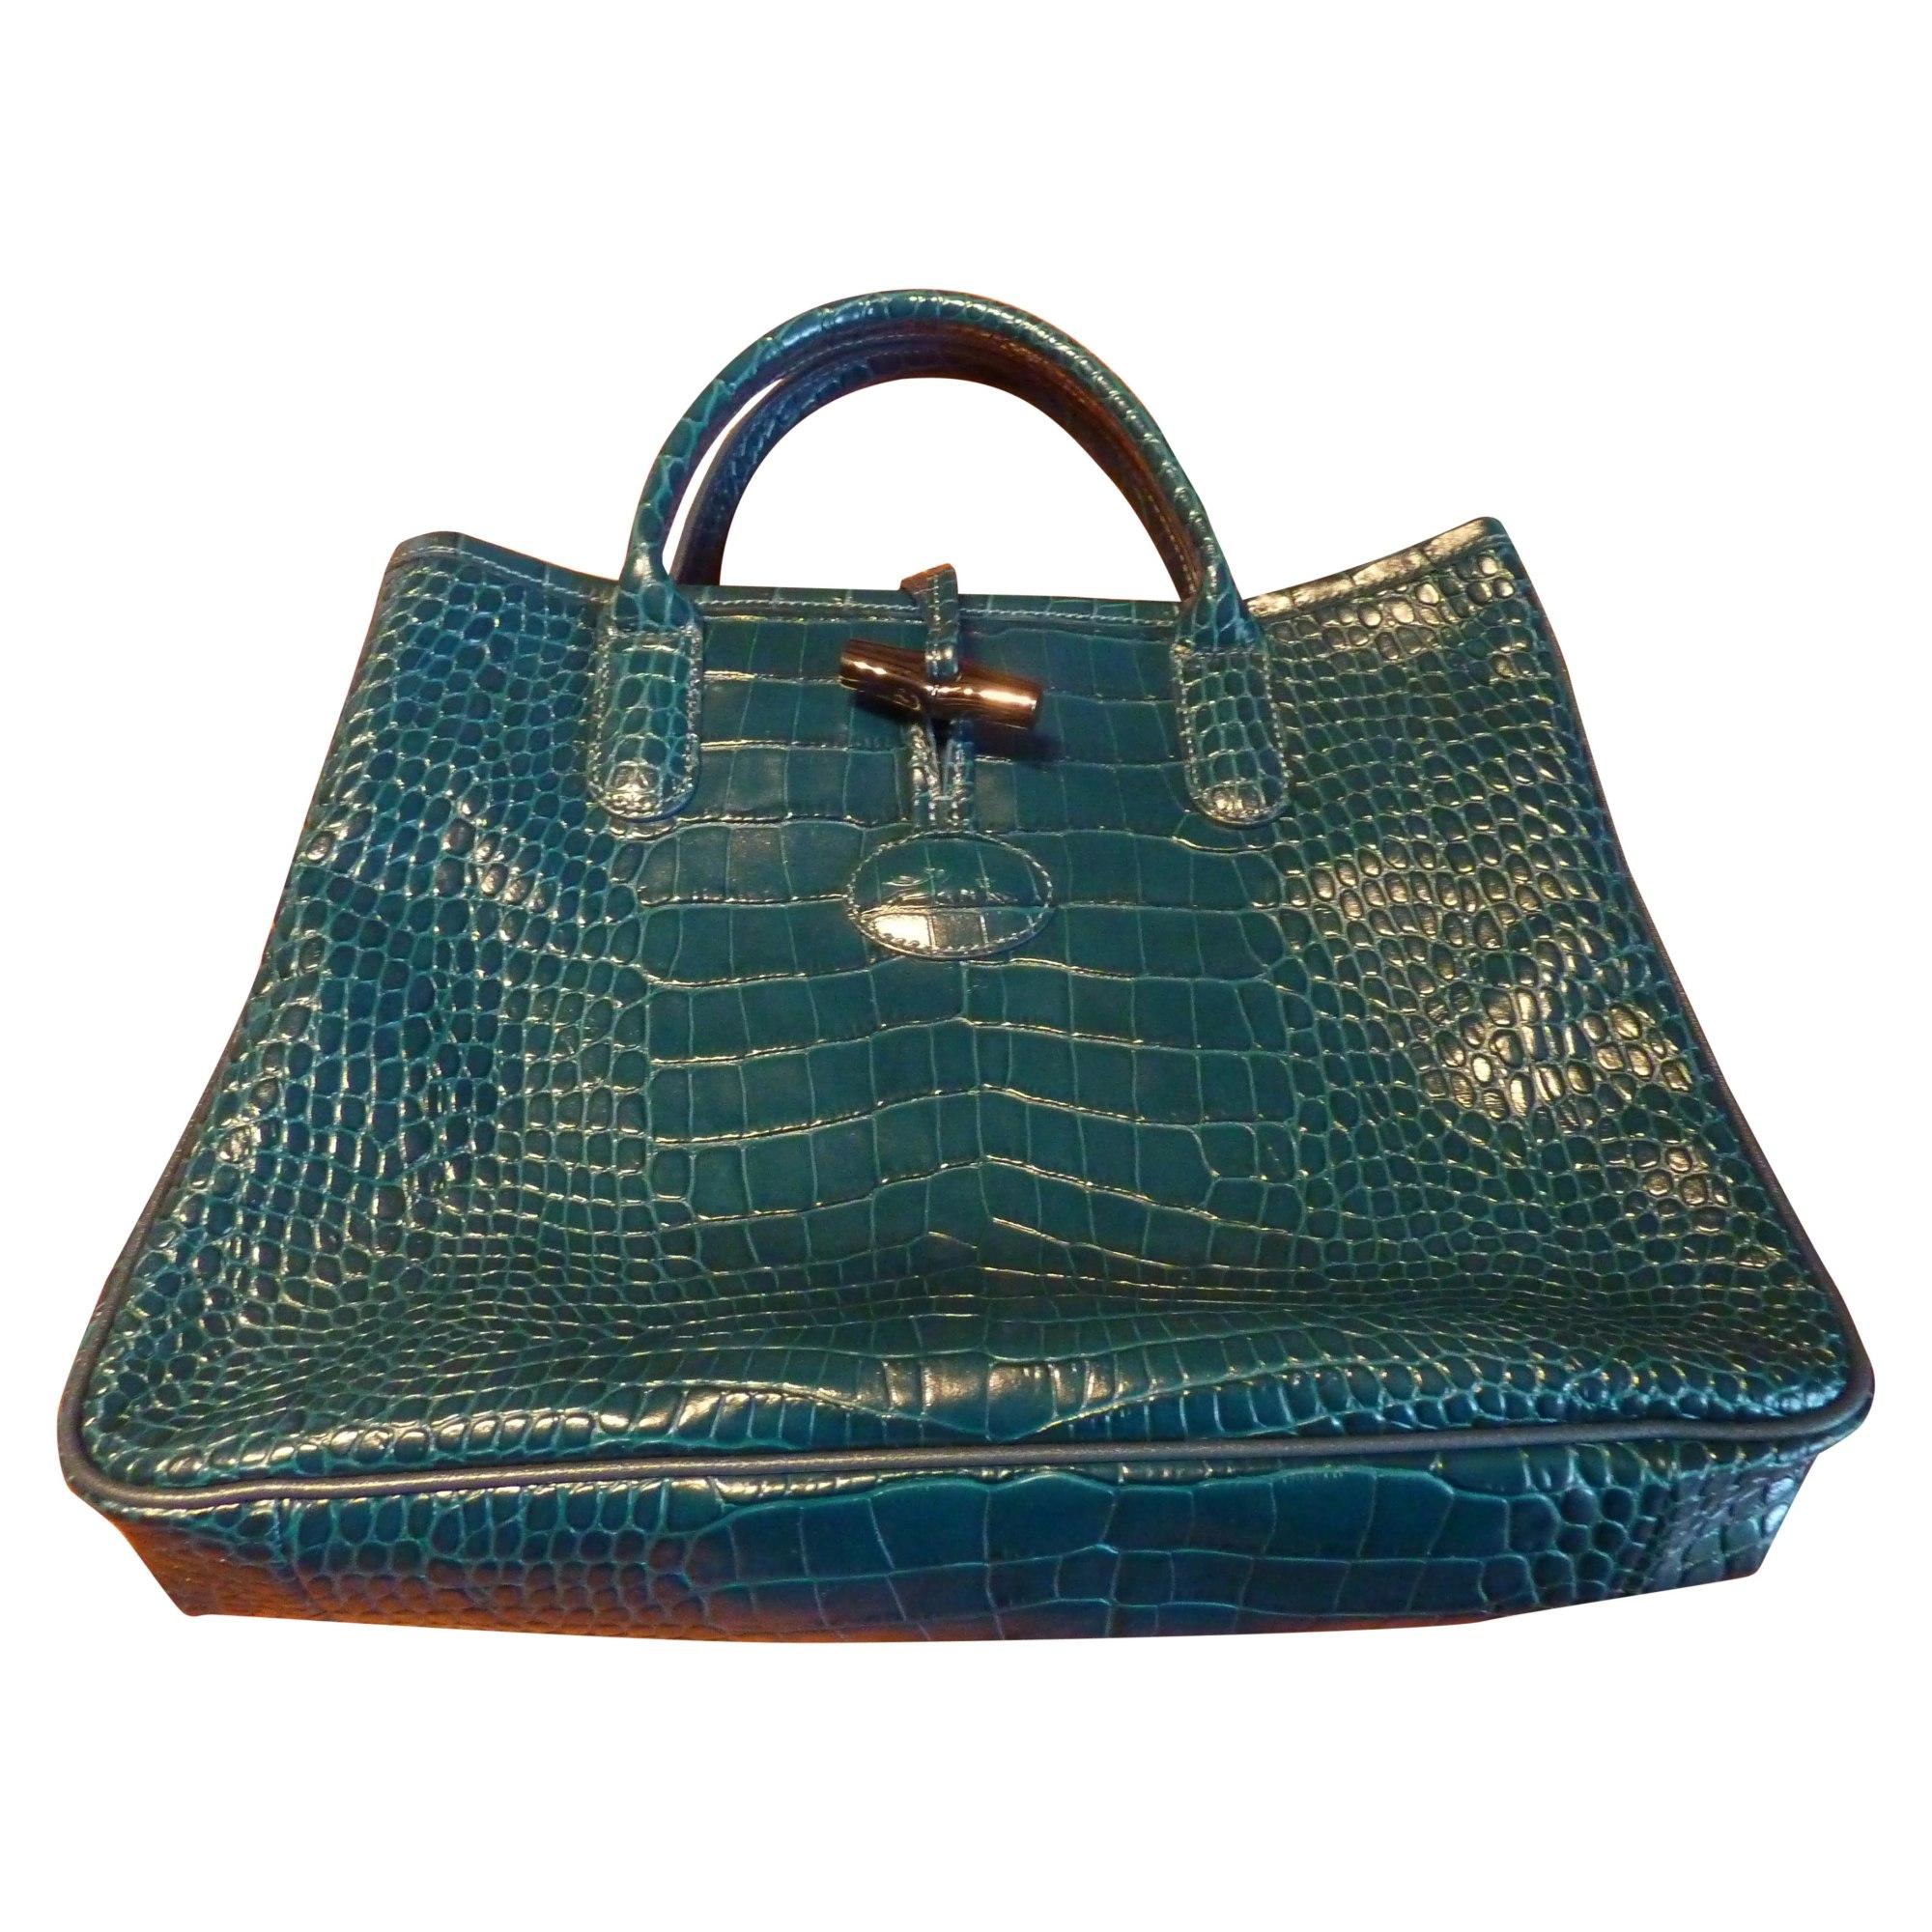 306171b2e67c Sac à main en cuir LONGCHAMP bleu vendu par Shopname275901 - 1608462